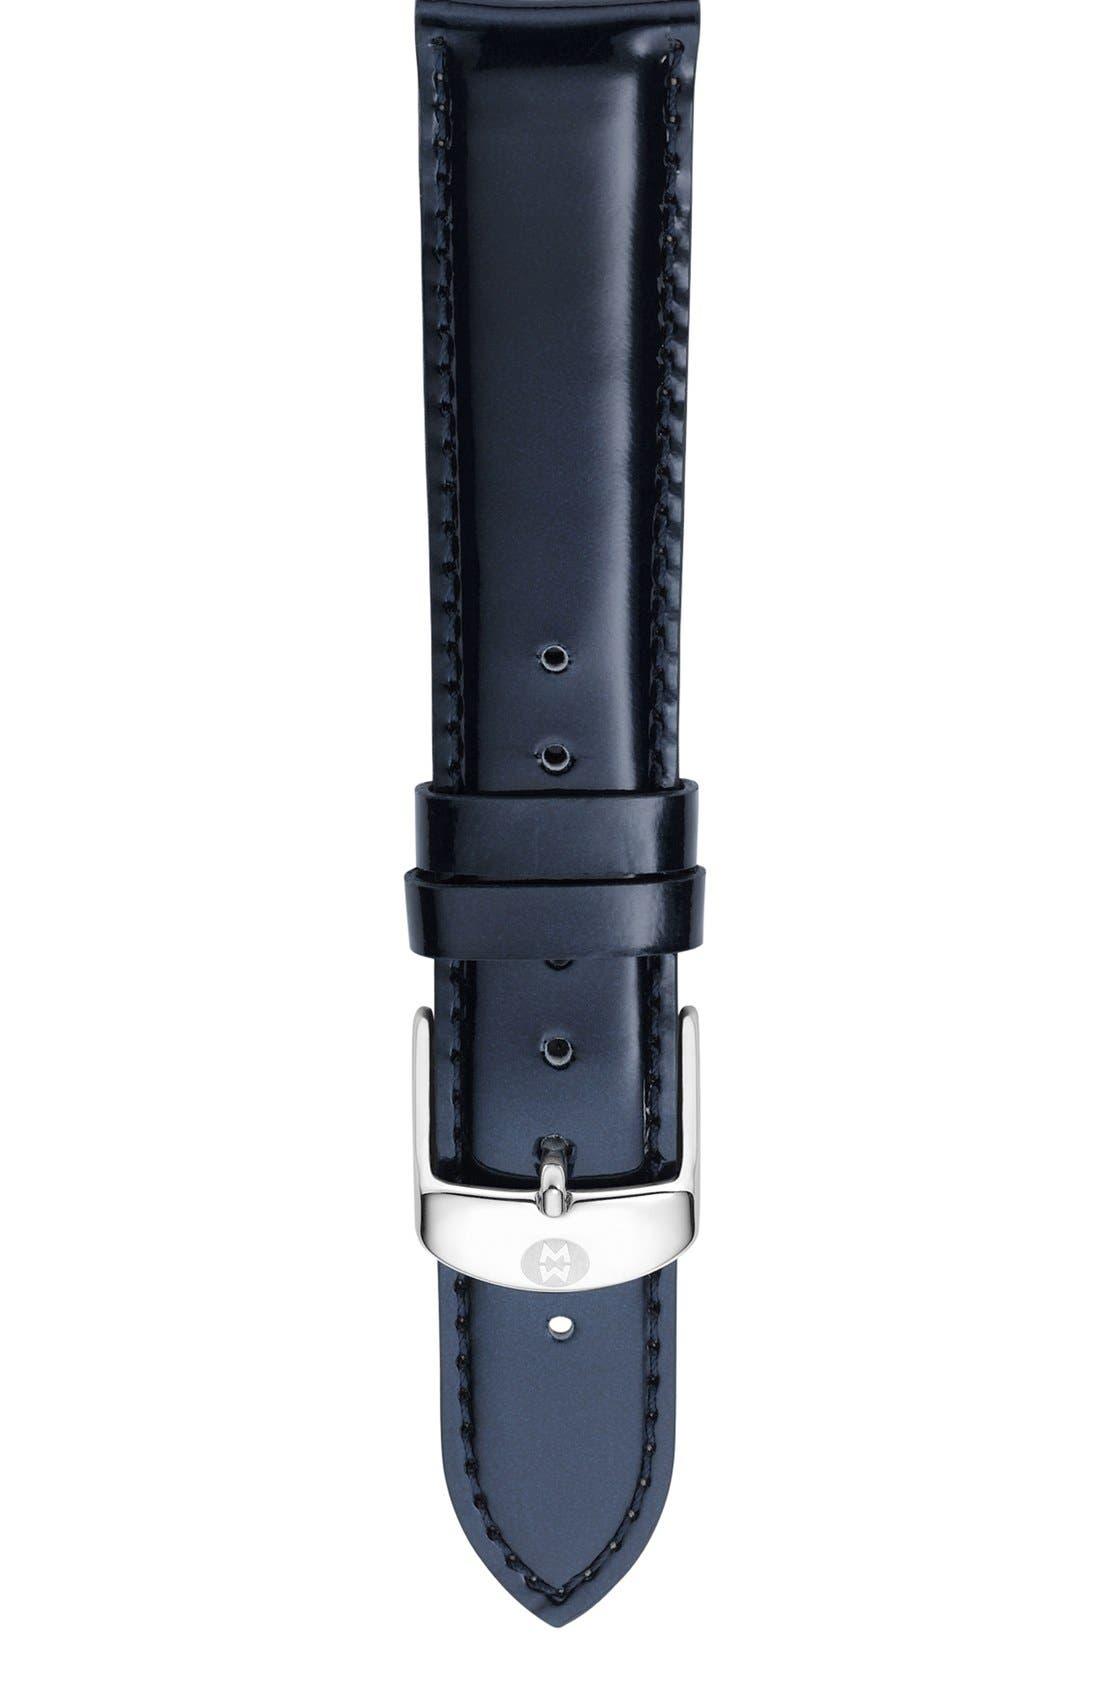 Main Image - MICHELE 'Deco Diamond' Watch Case & 18mm Patent Leather Strap